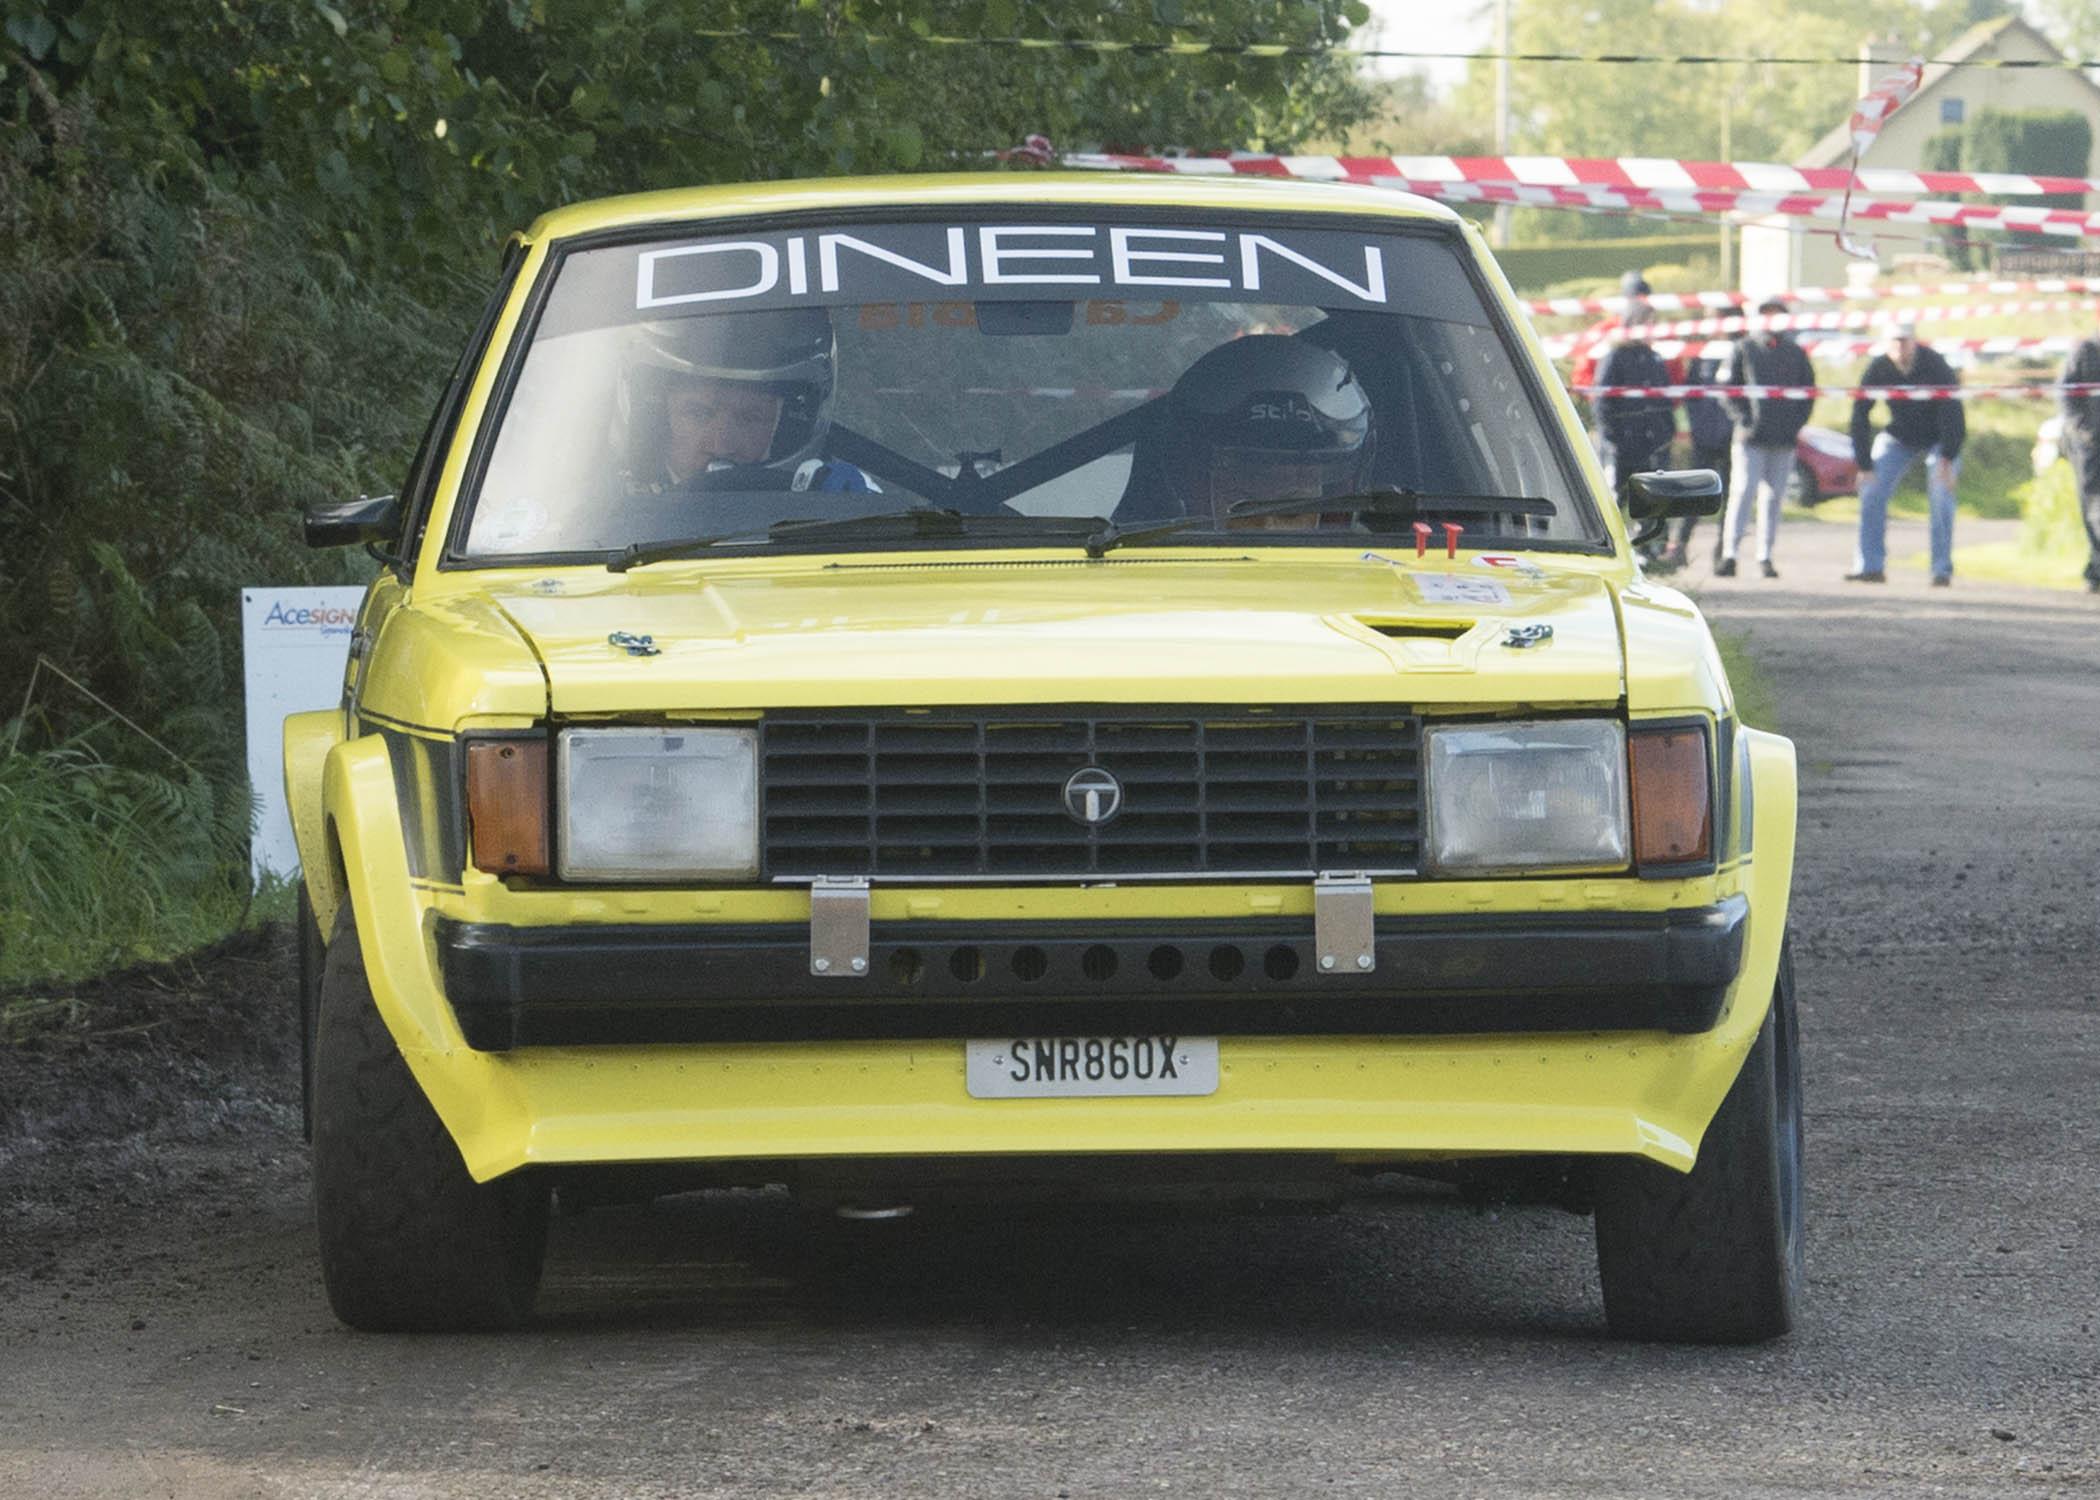 DINEEN1